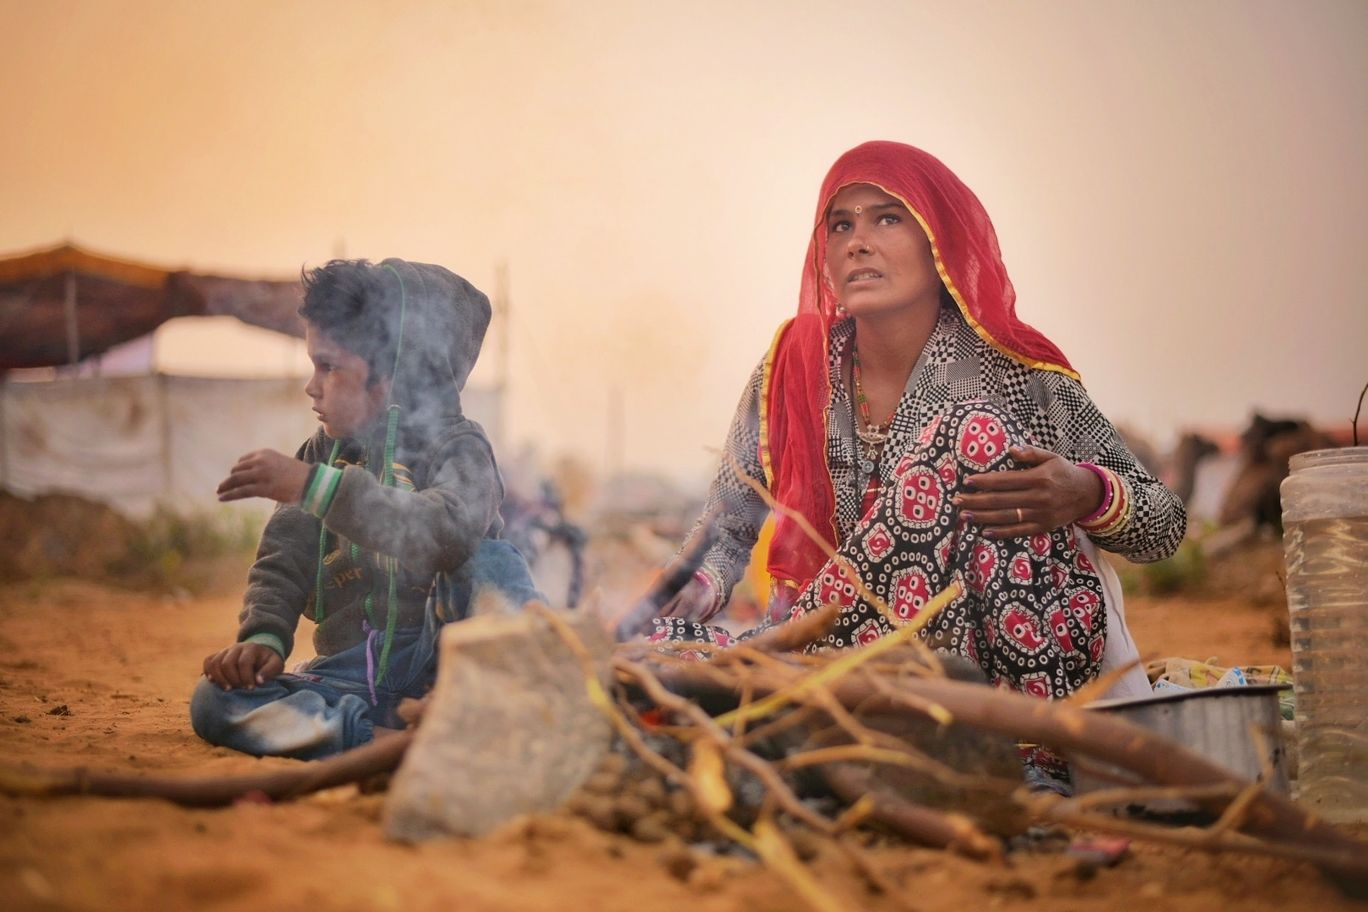 Photo of Pushkar By Manish Kumar